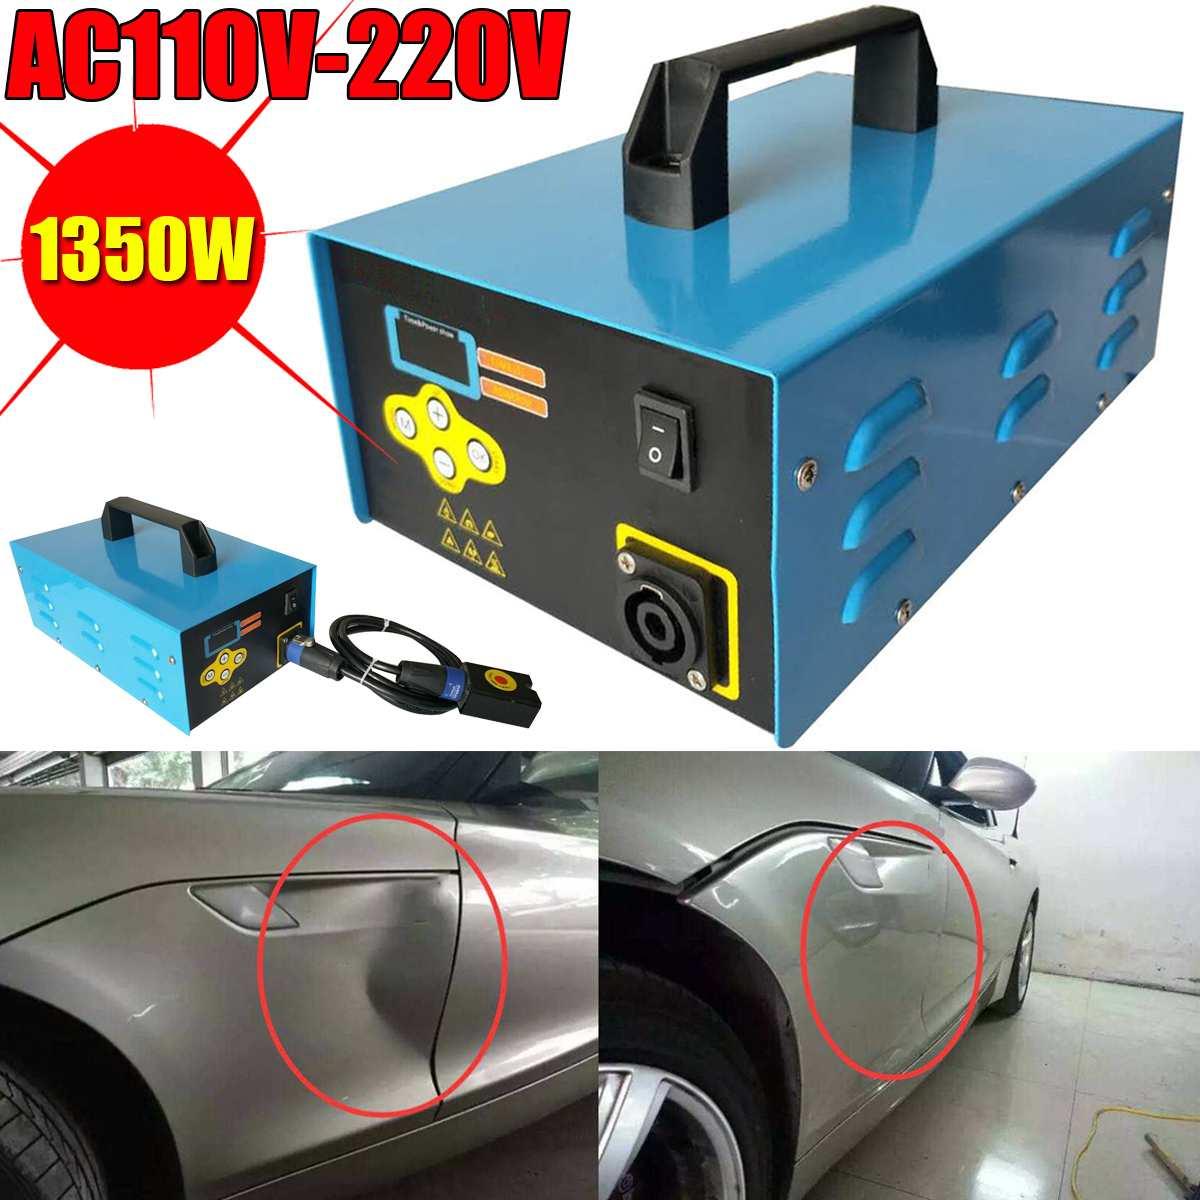 220 V/110 V 1350 W Auto Blu Ammaccature senza vernice Riparazione Rimozione Riscaldatore A Induzione Hot Box Riscaldatore A Induzione Elettromagnetica per la Riparazione